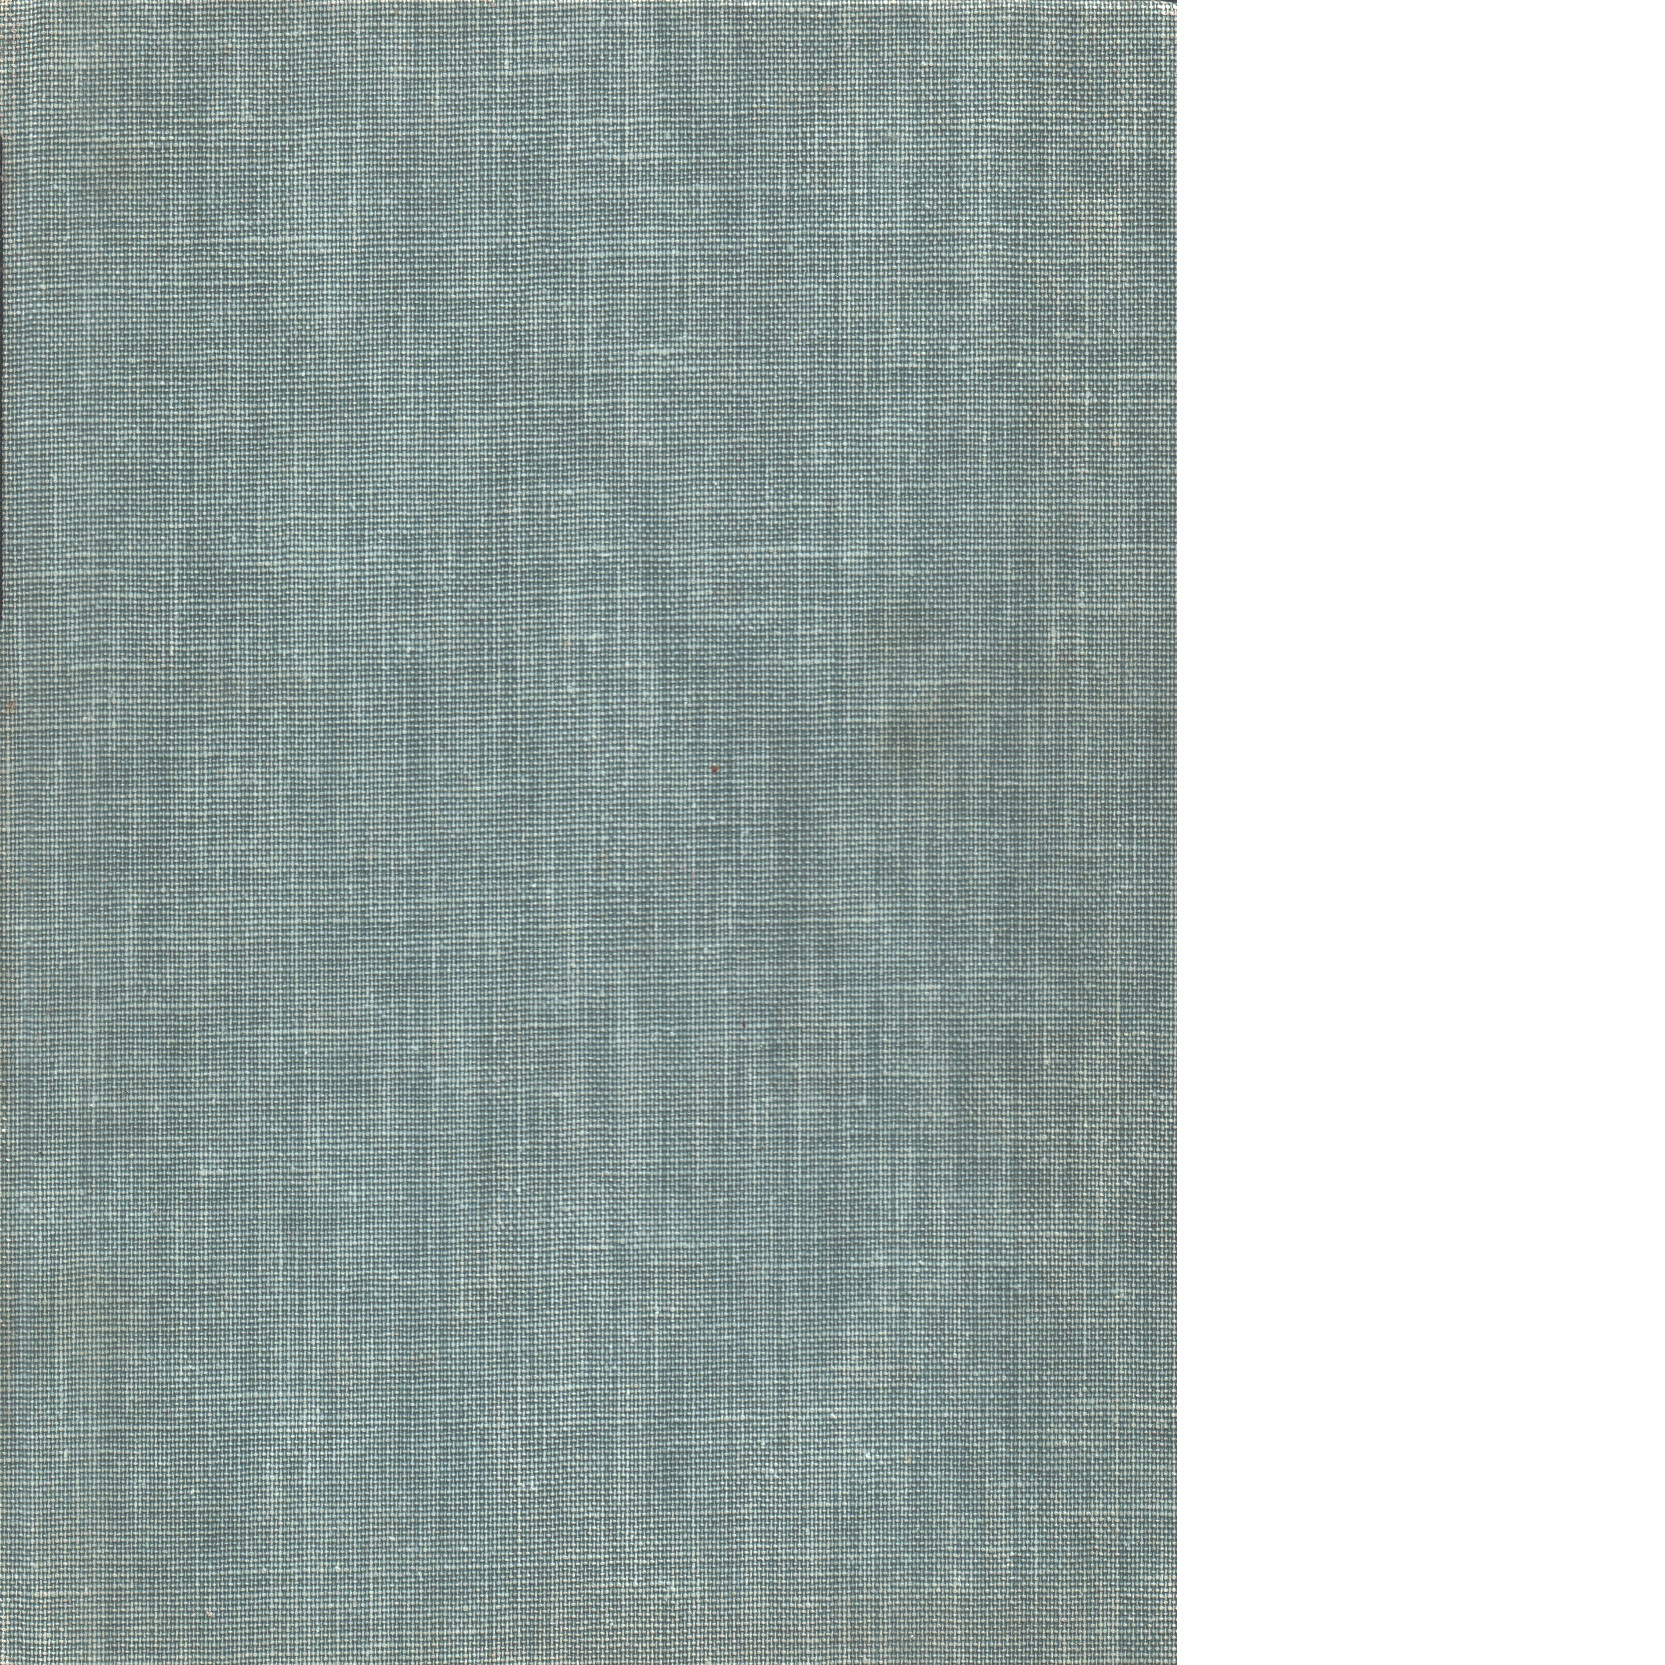 Ernst Josephsons konst : historie-, porträtt- och genremålaren - Blomberg, Erik